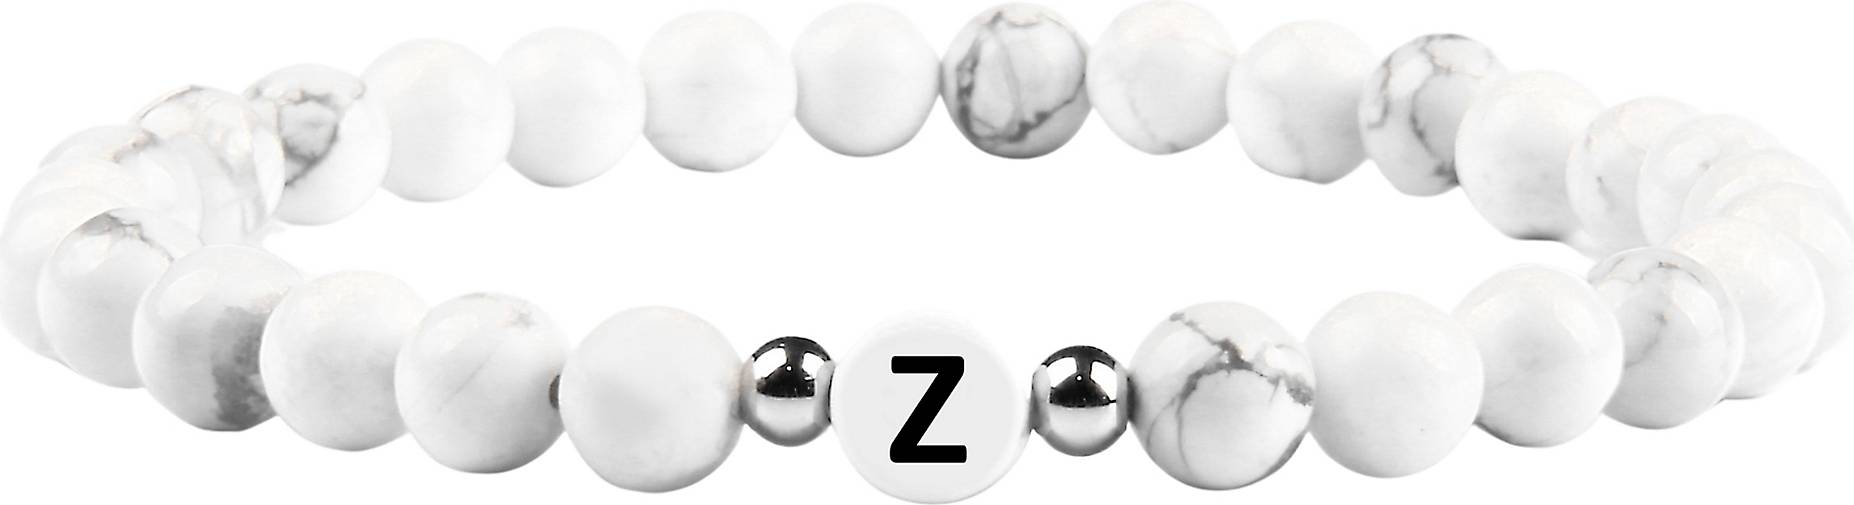 GOOD.designs Howlitharmband Ab-Weiss-Z